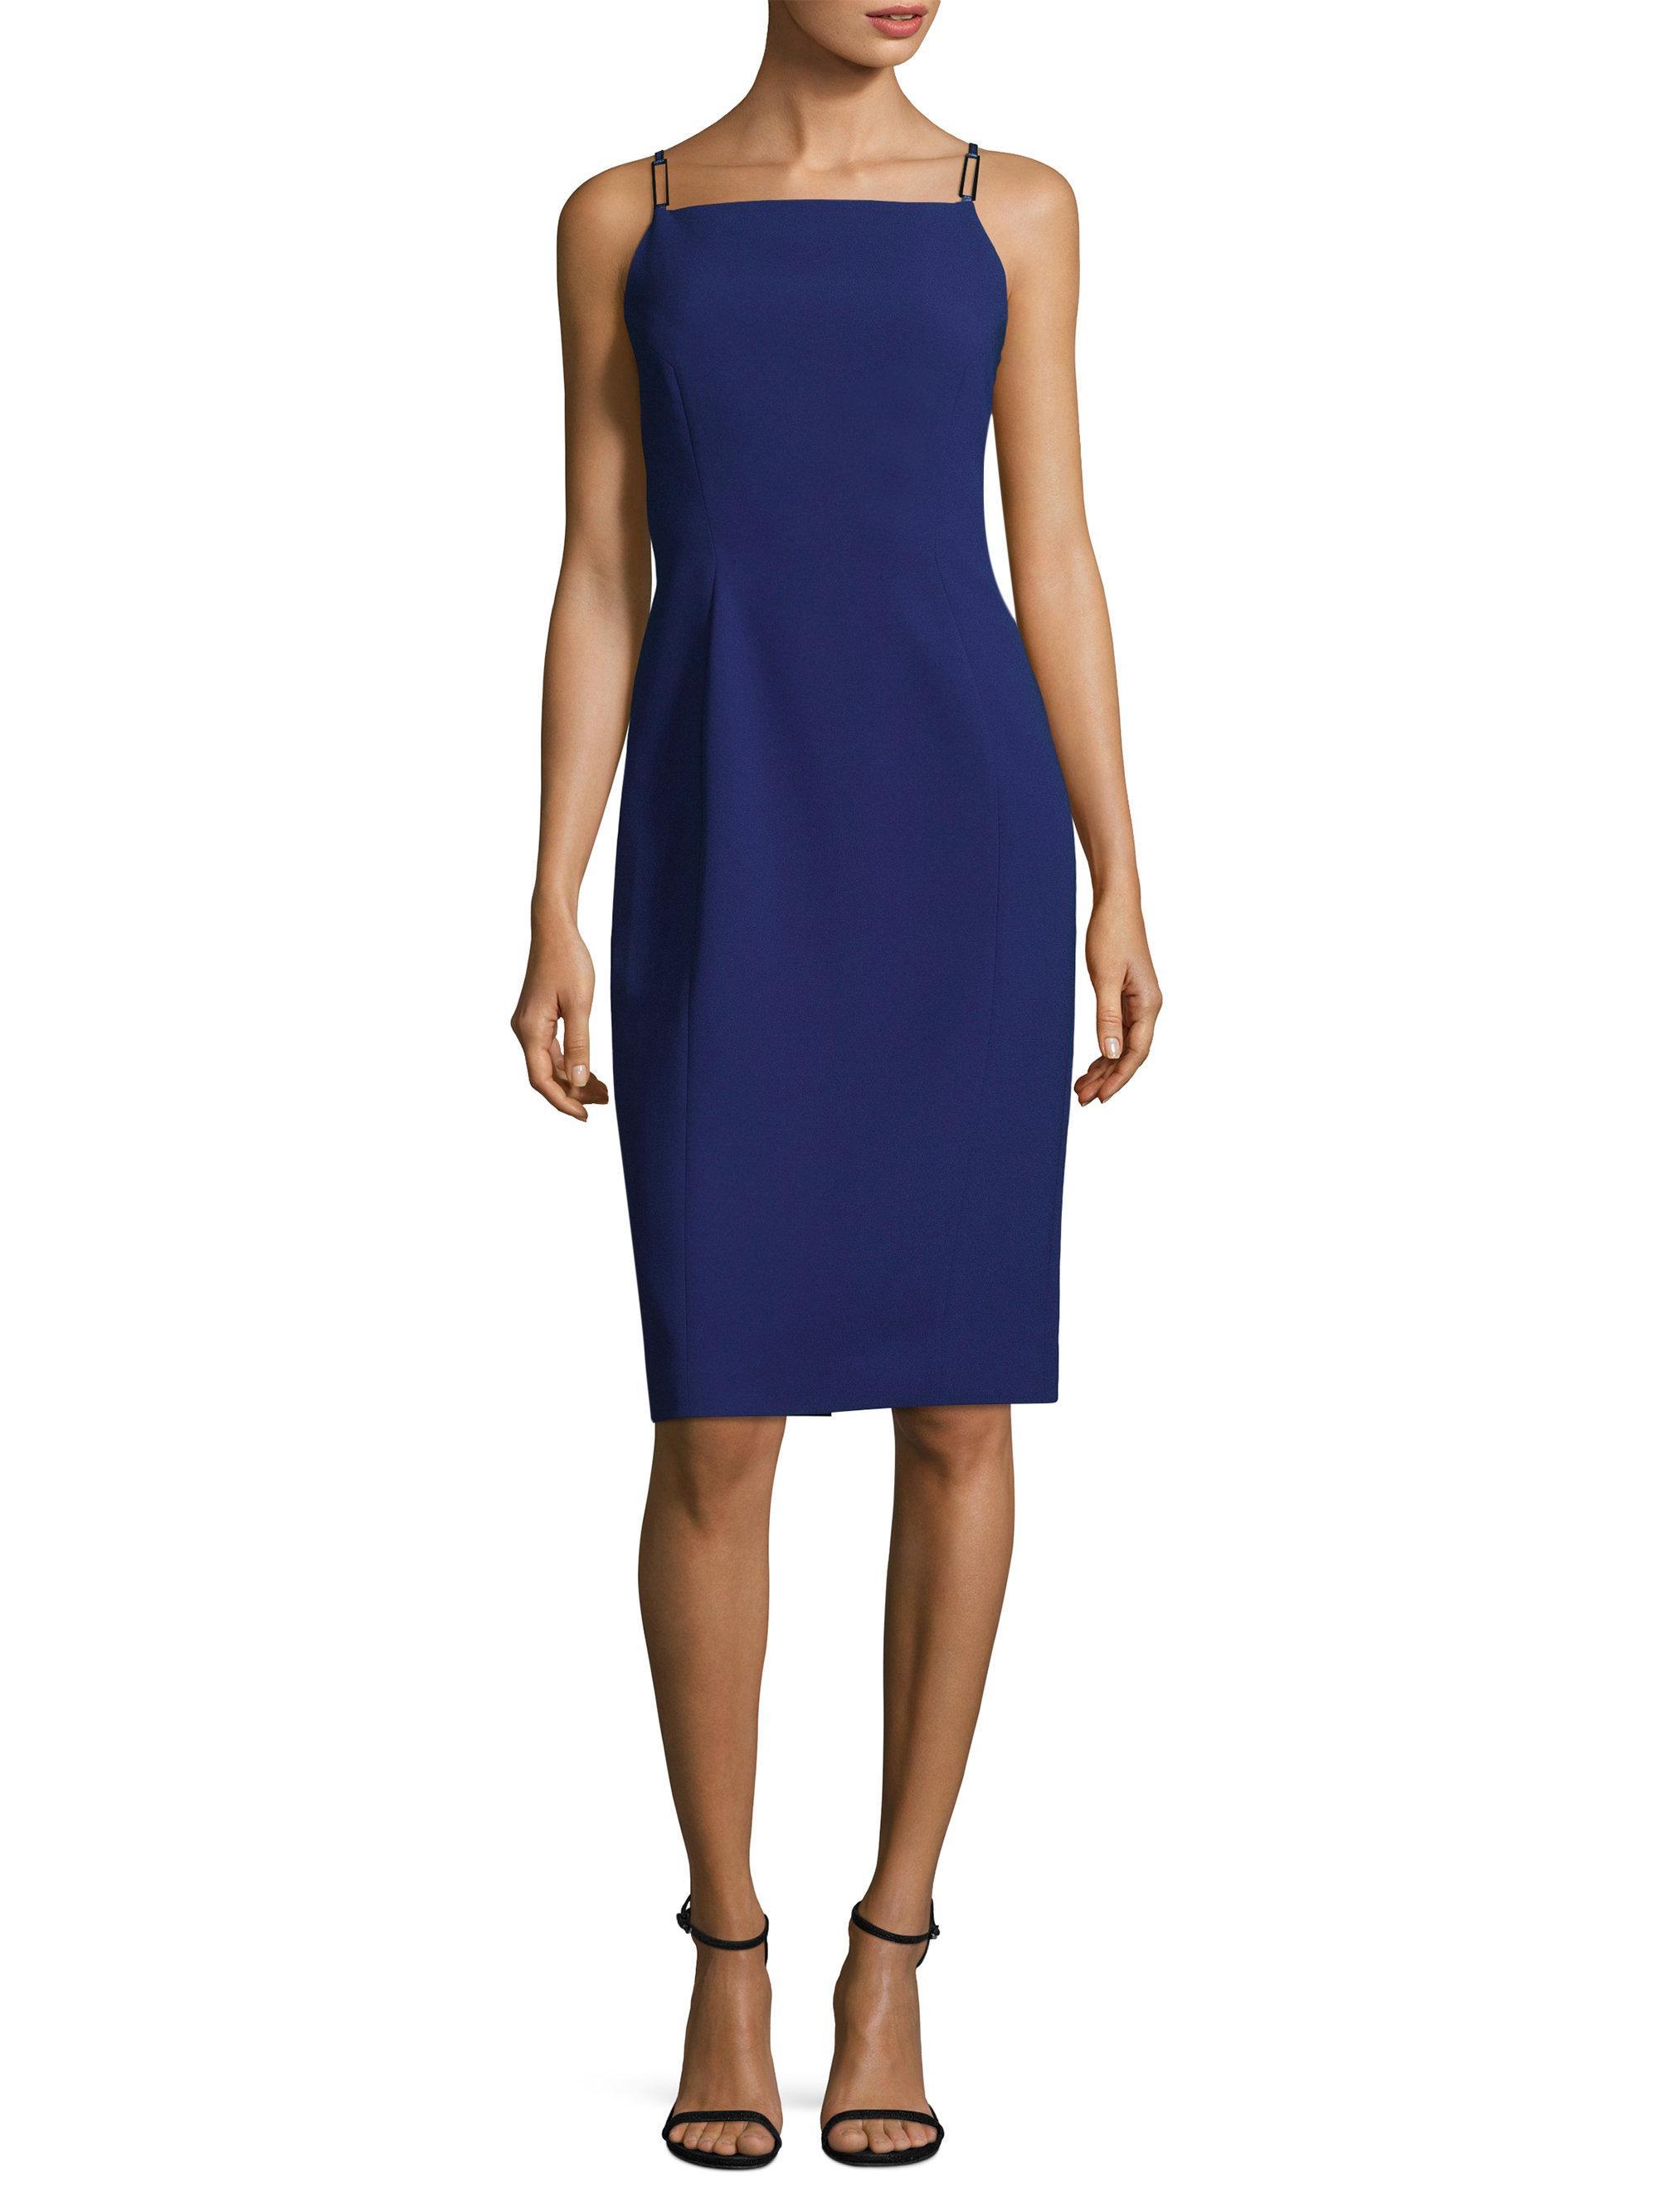 Lyst elie tahari vereda knee length sheath dress in blue for Saks fifth avenue wedding guest dresses